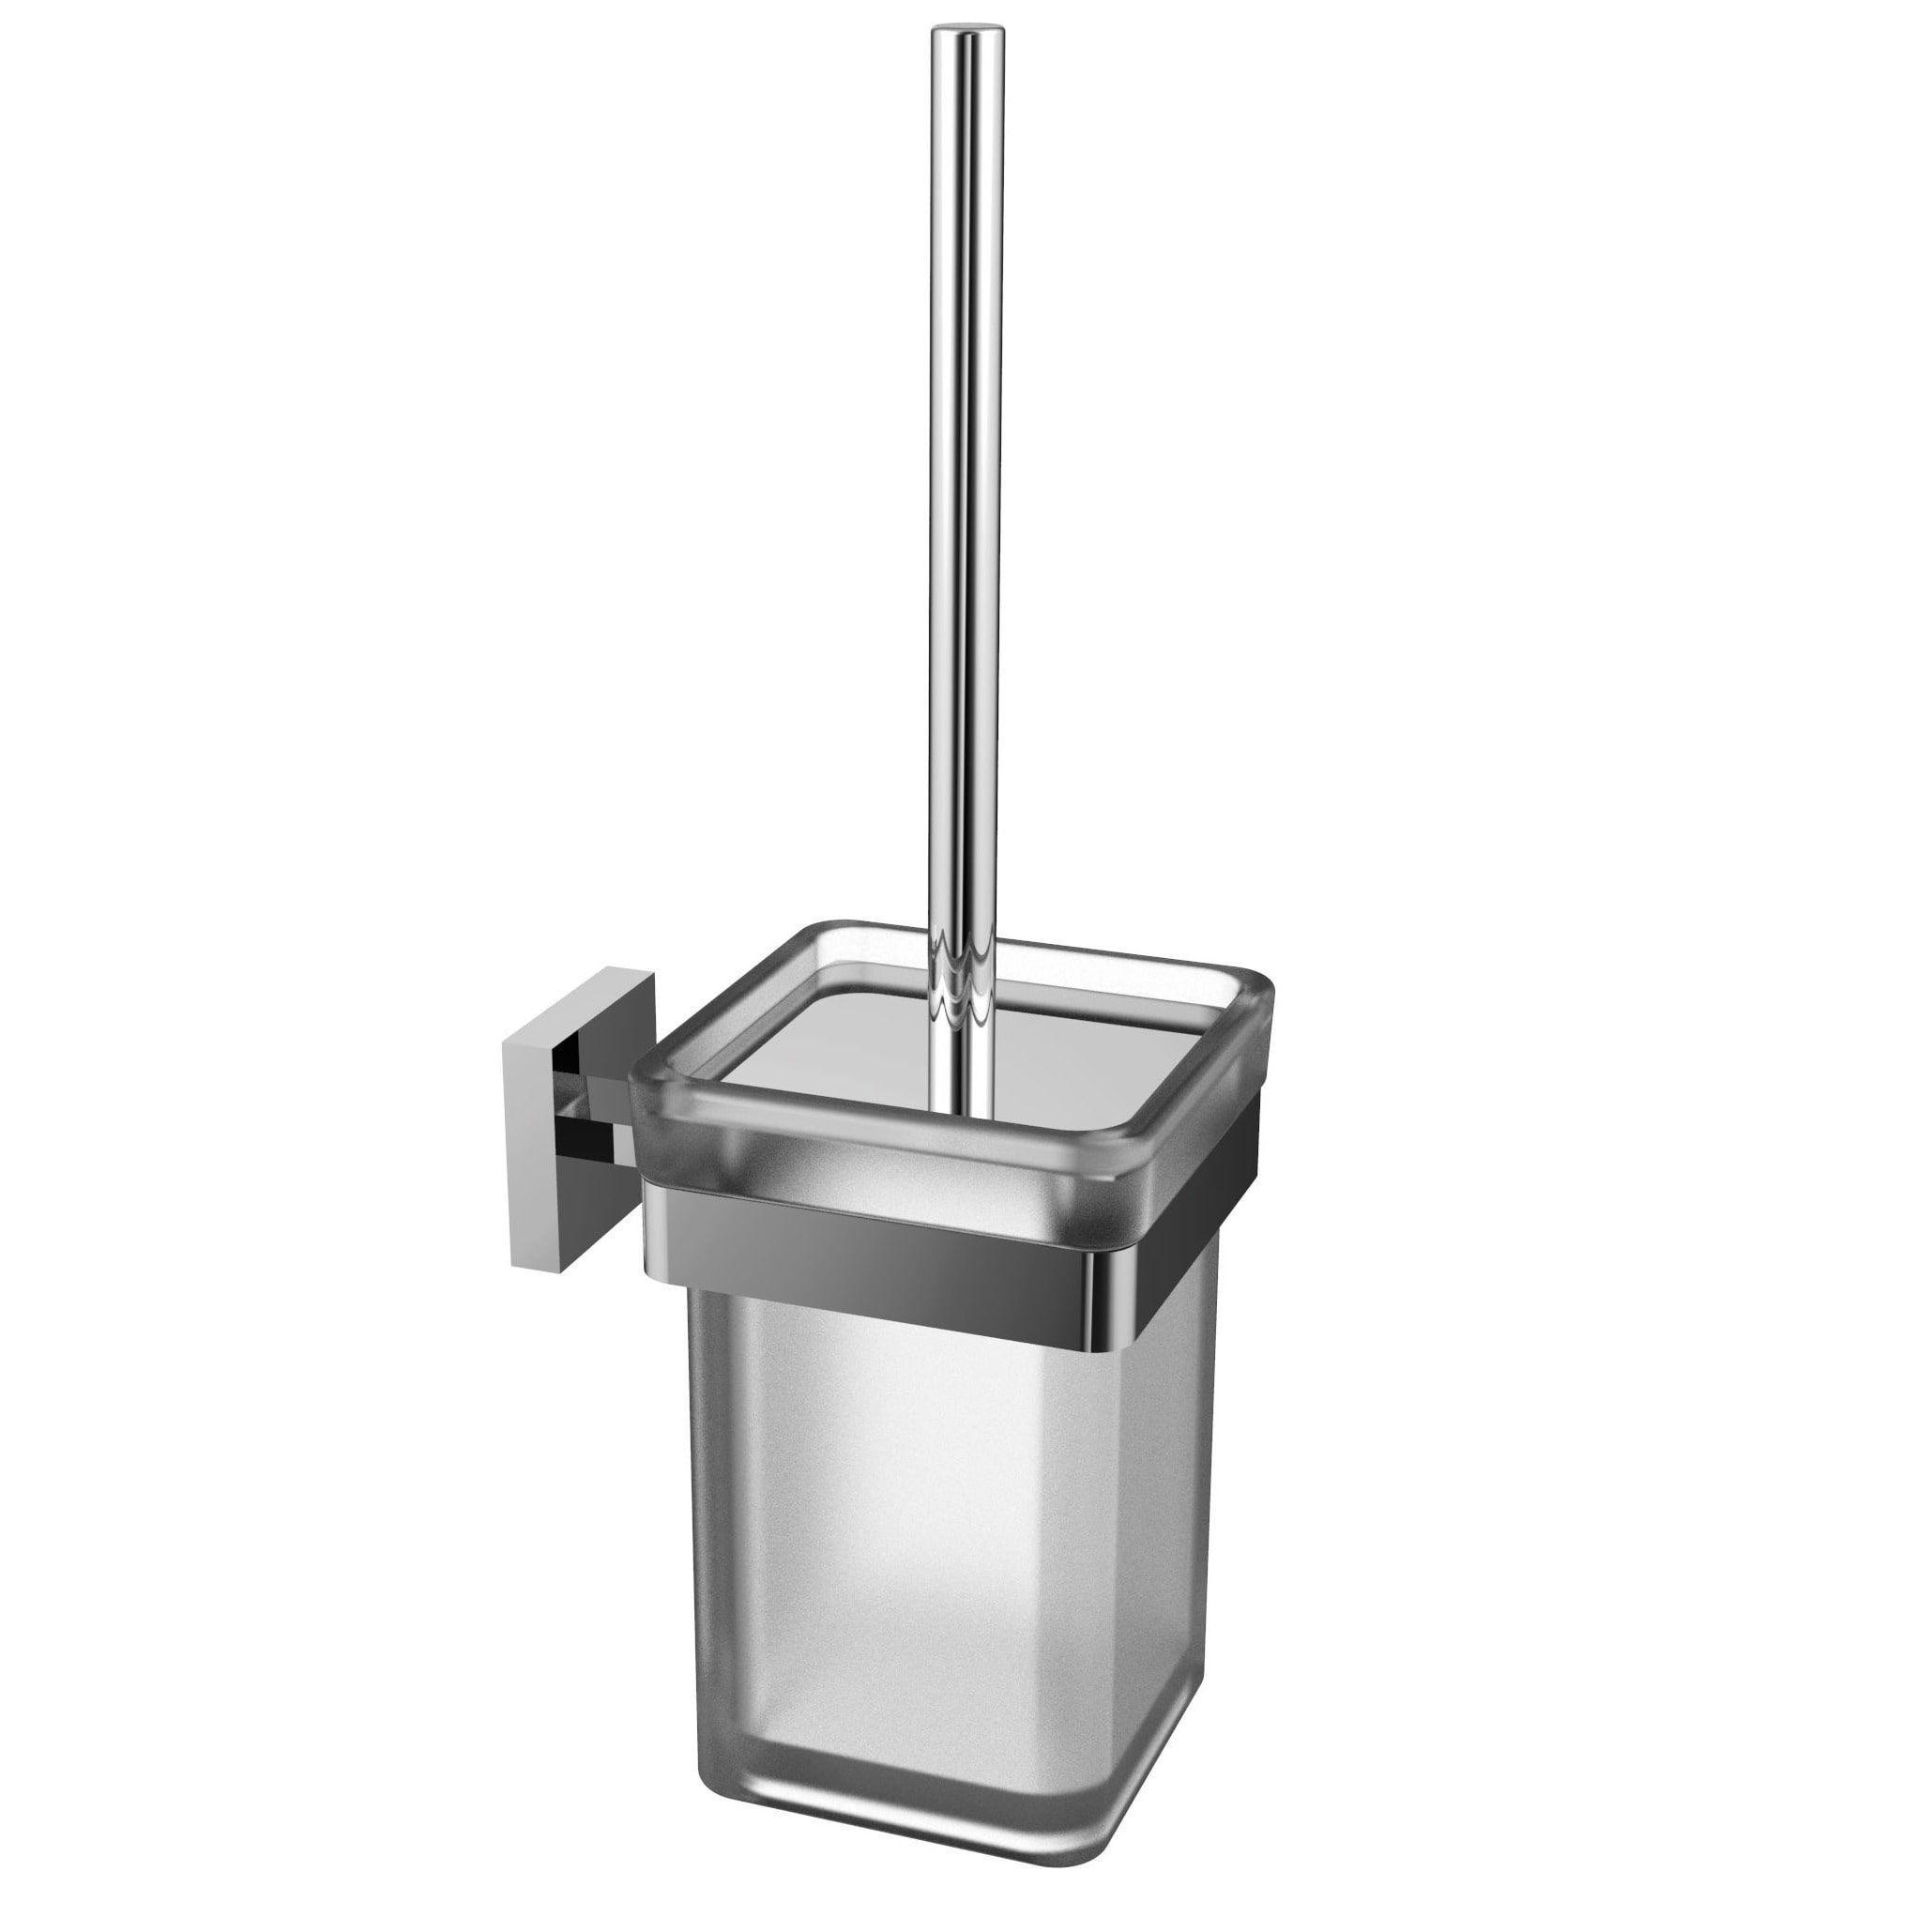 Eviva Cleansi Bathroom Accessories Chrome Finish Brass Toilet Brush ...